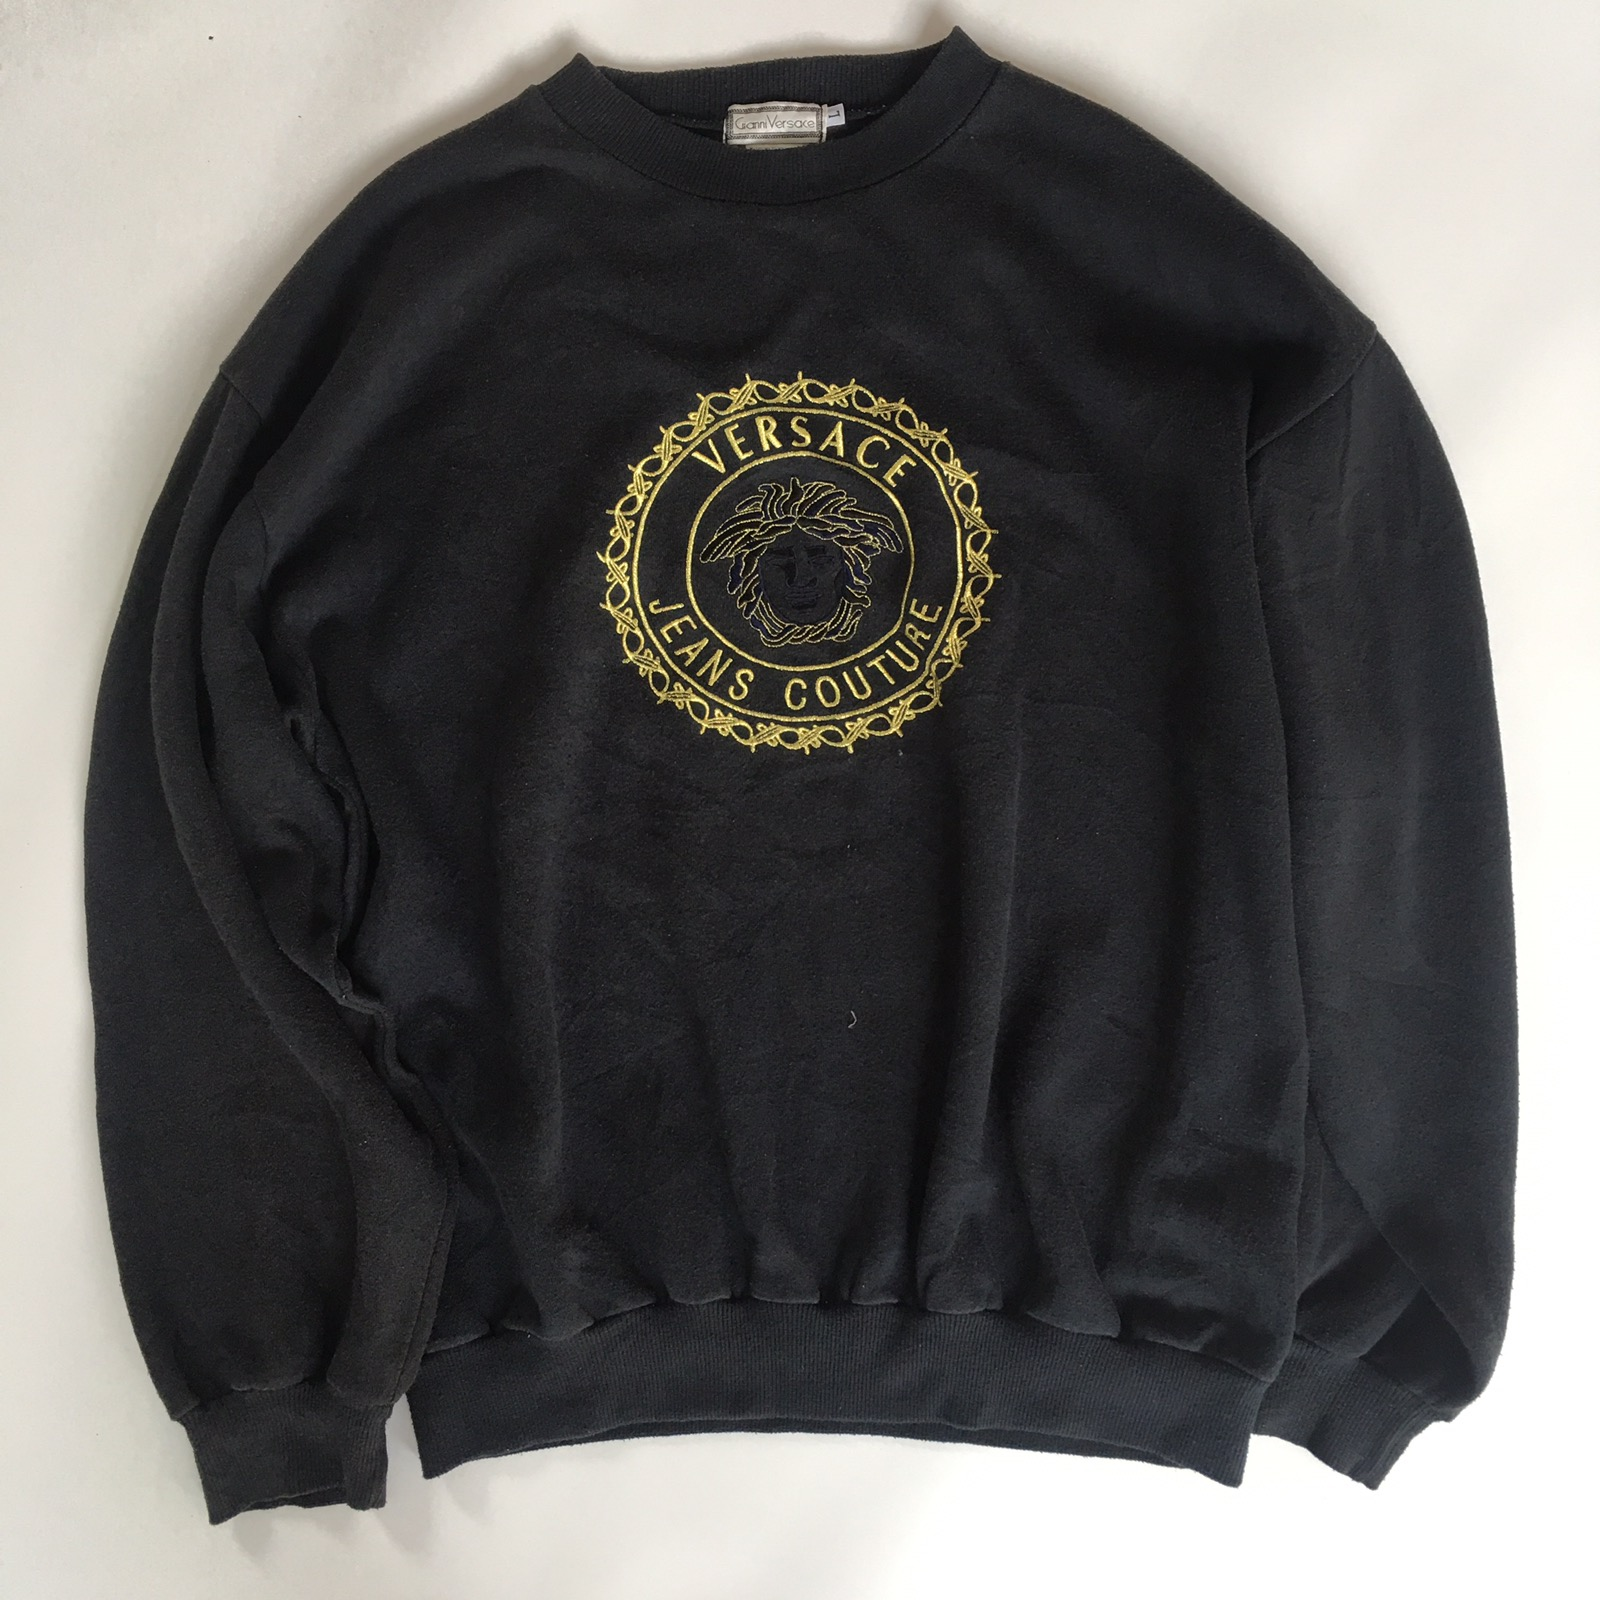 a680446040f Versace. Vintage Gianni Versace Sweatshirt Medusa Gold Head made in italy  not gucci supreme louis vuitton givenchy balmain saint laurent ...